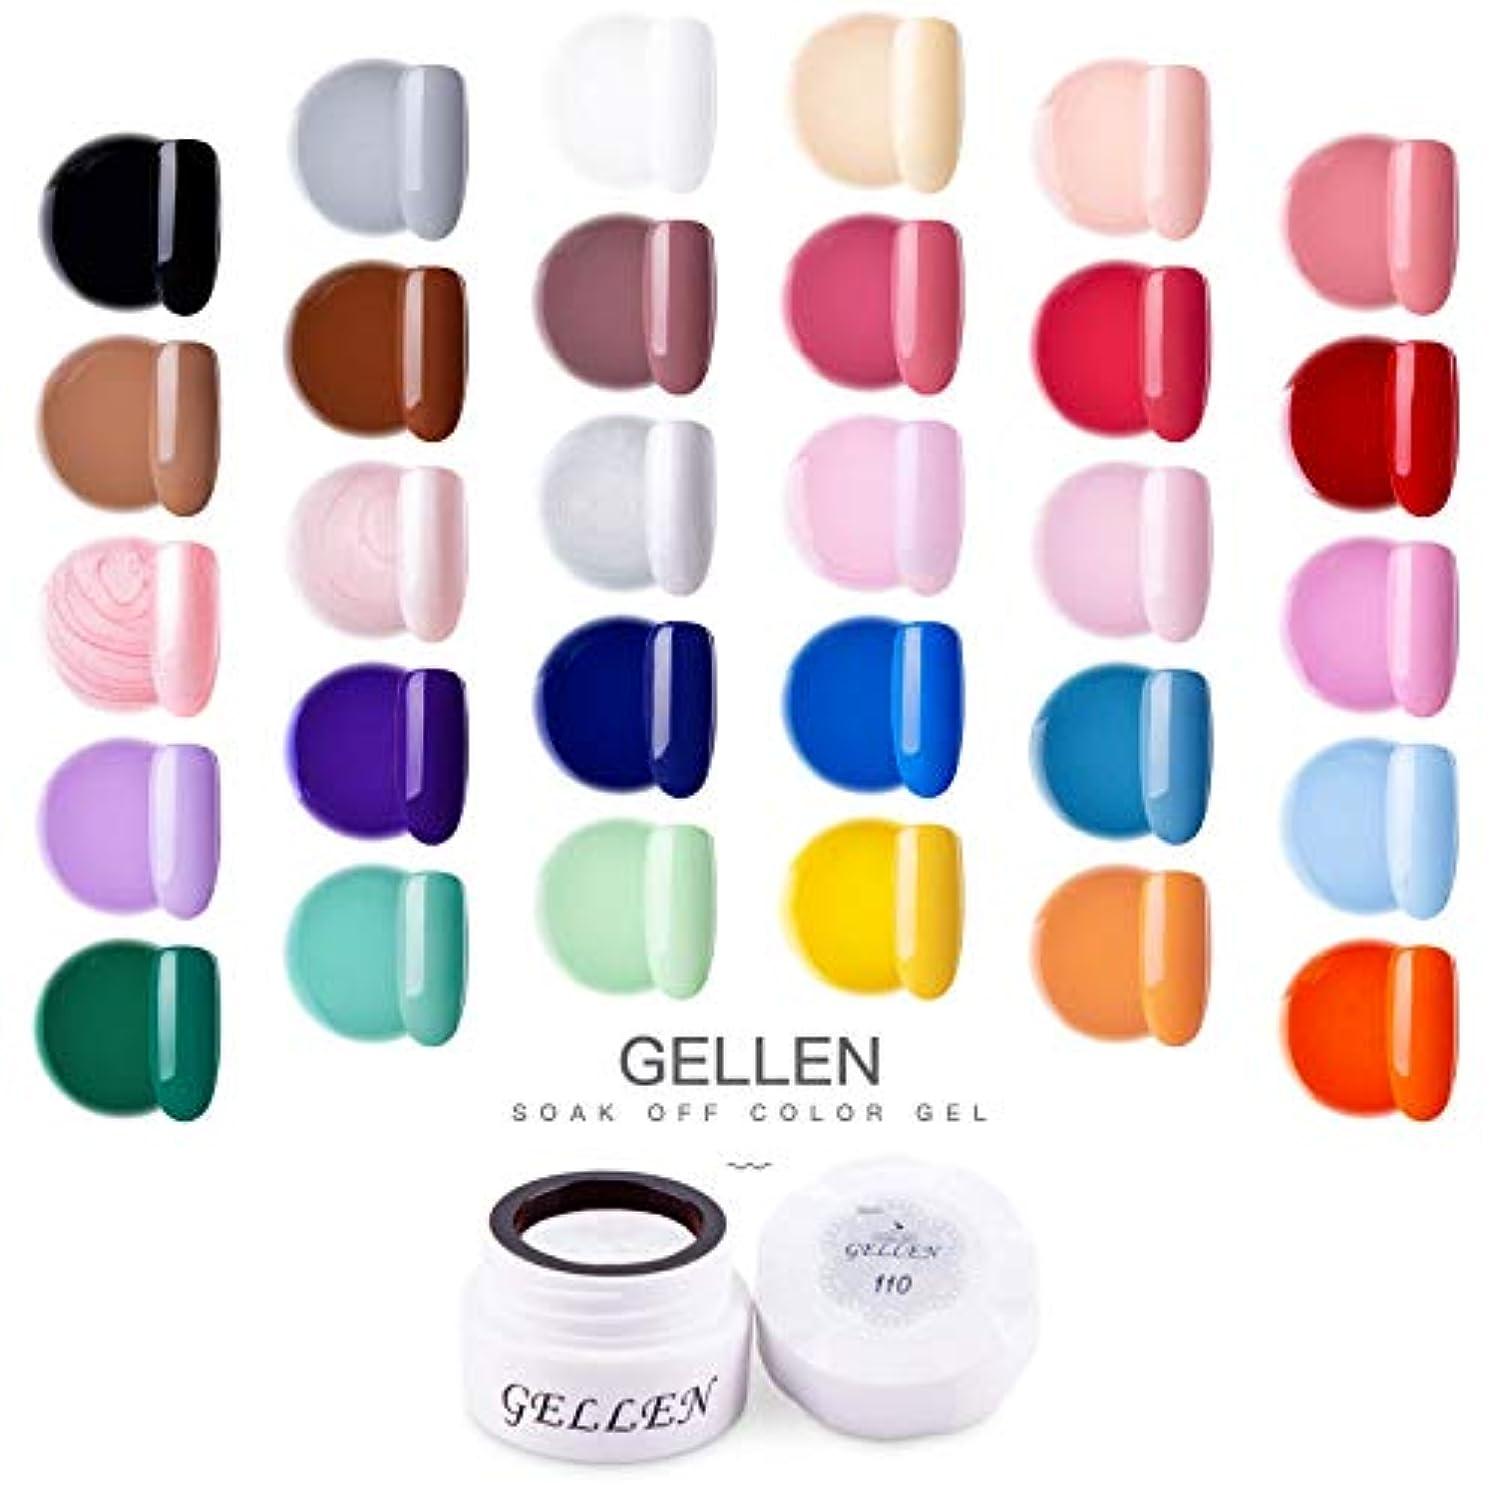 Gellen カラージェル 30色定番カラー セット 高品質 5g ジェルネイル カラー ネイルブラシ付き